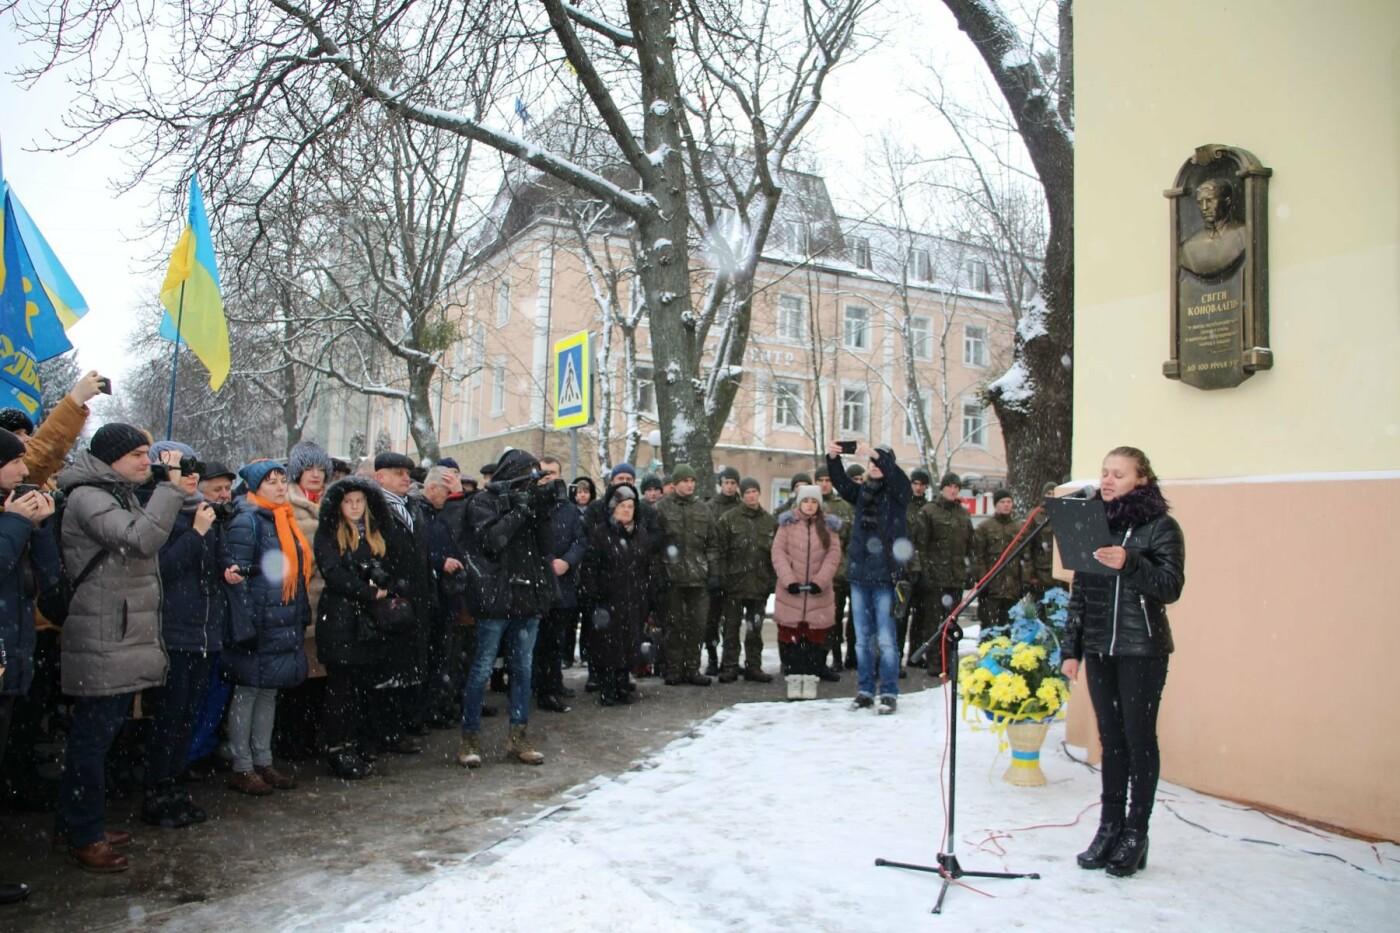 У Хмельницькому відкрили пам'ятну дошку Коновальцю, фото-1